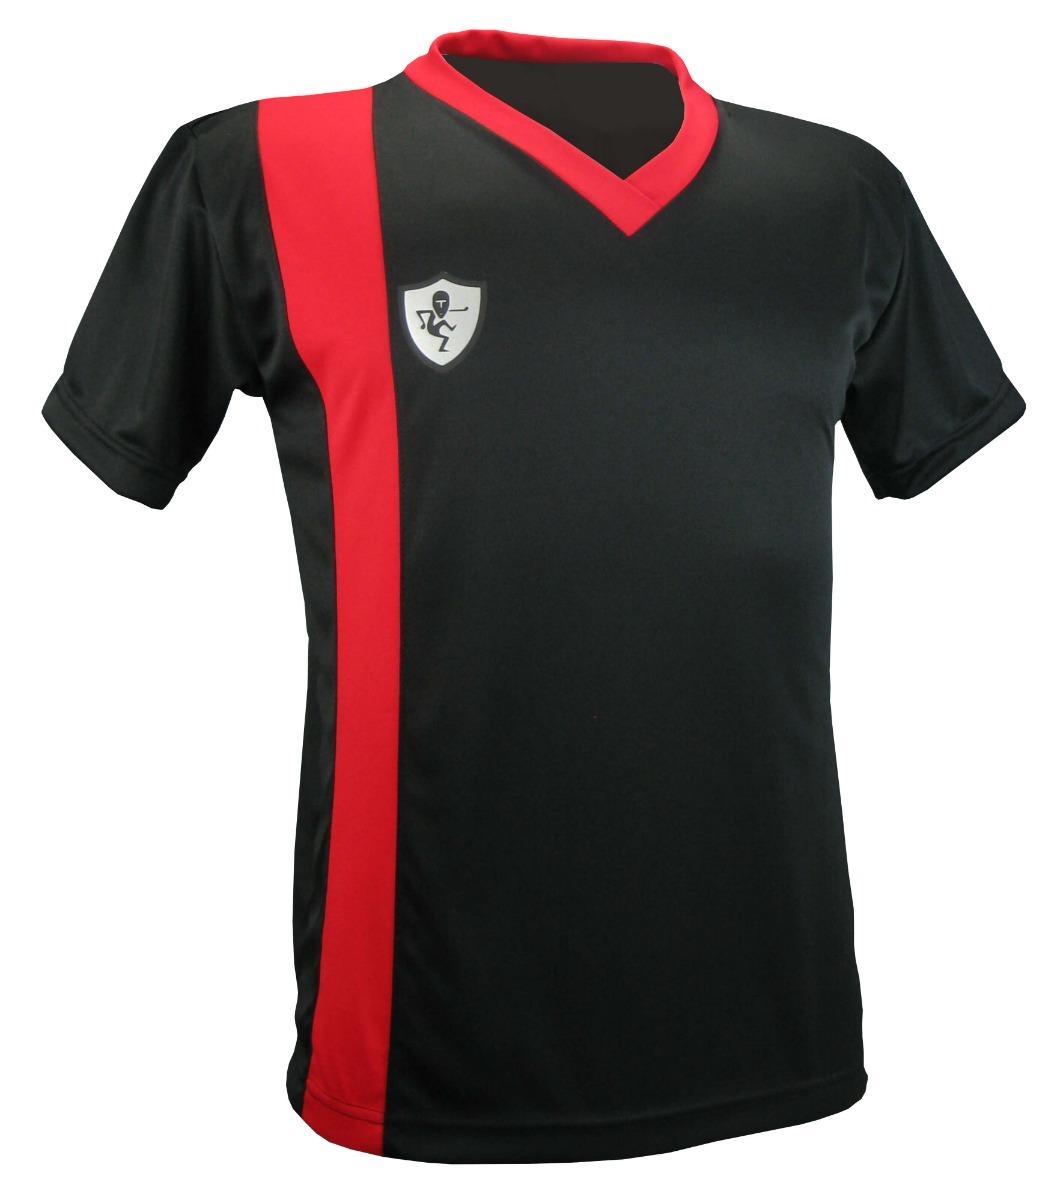 cace87142cf08 camiseta futbol yakka modelo juma numerada short medias. Cargando zoom.